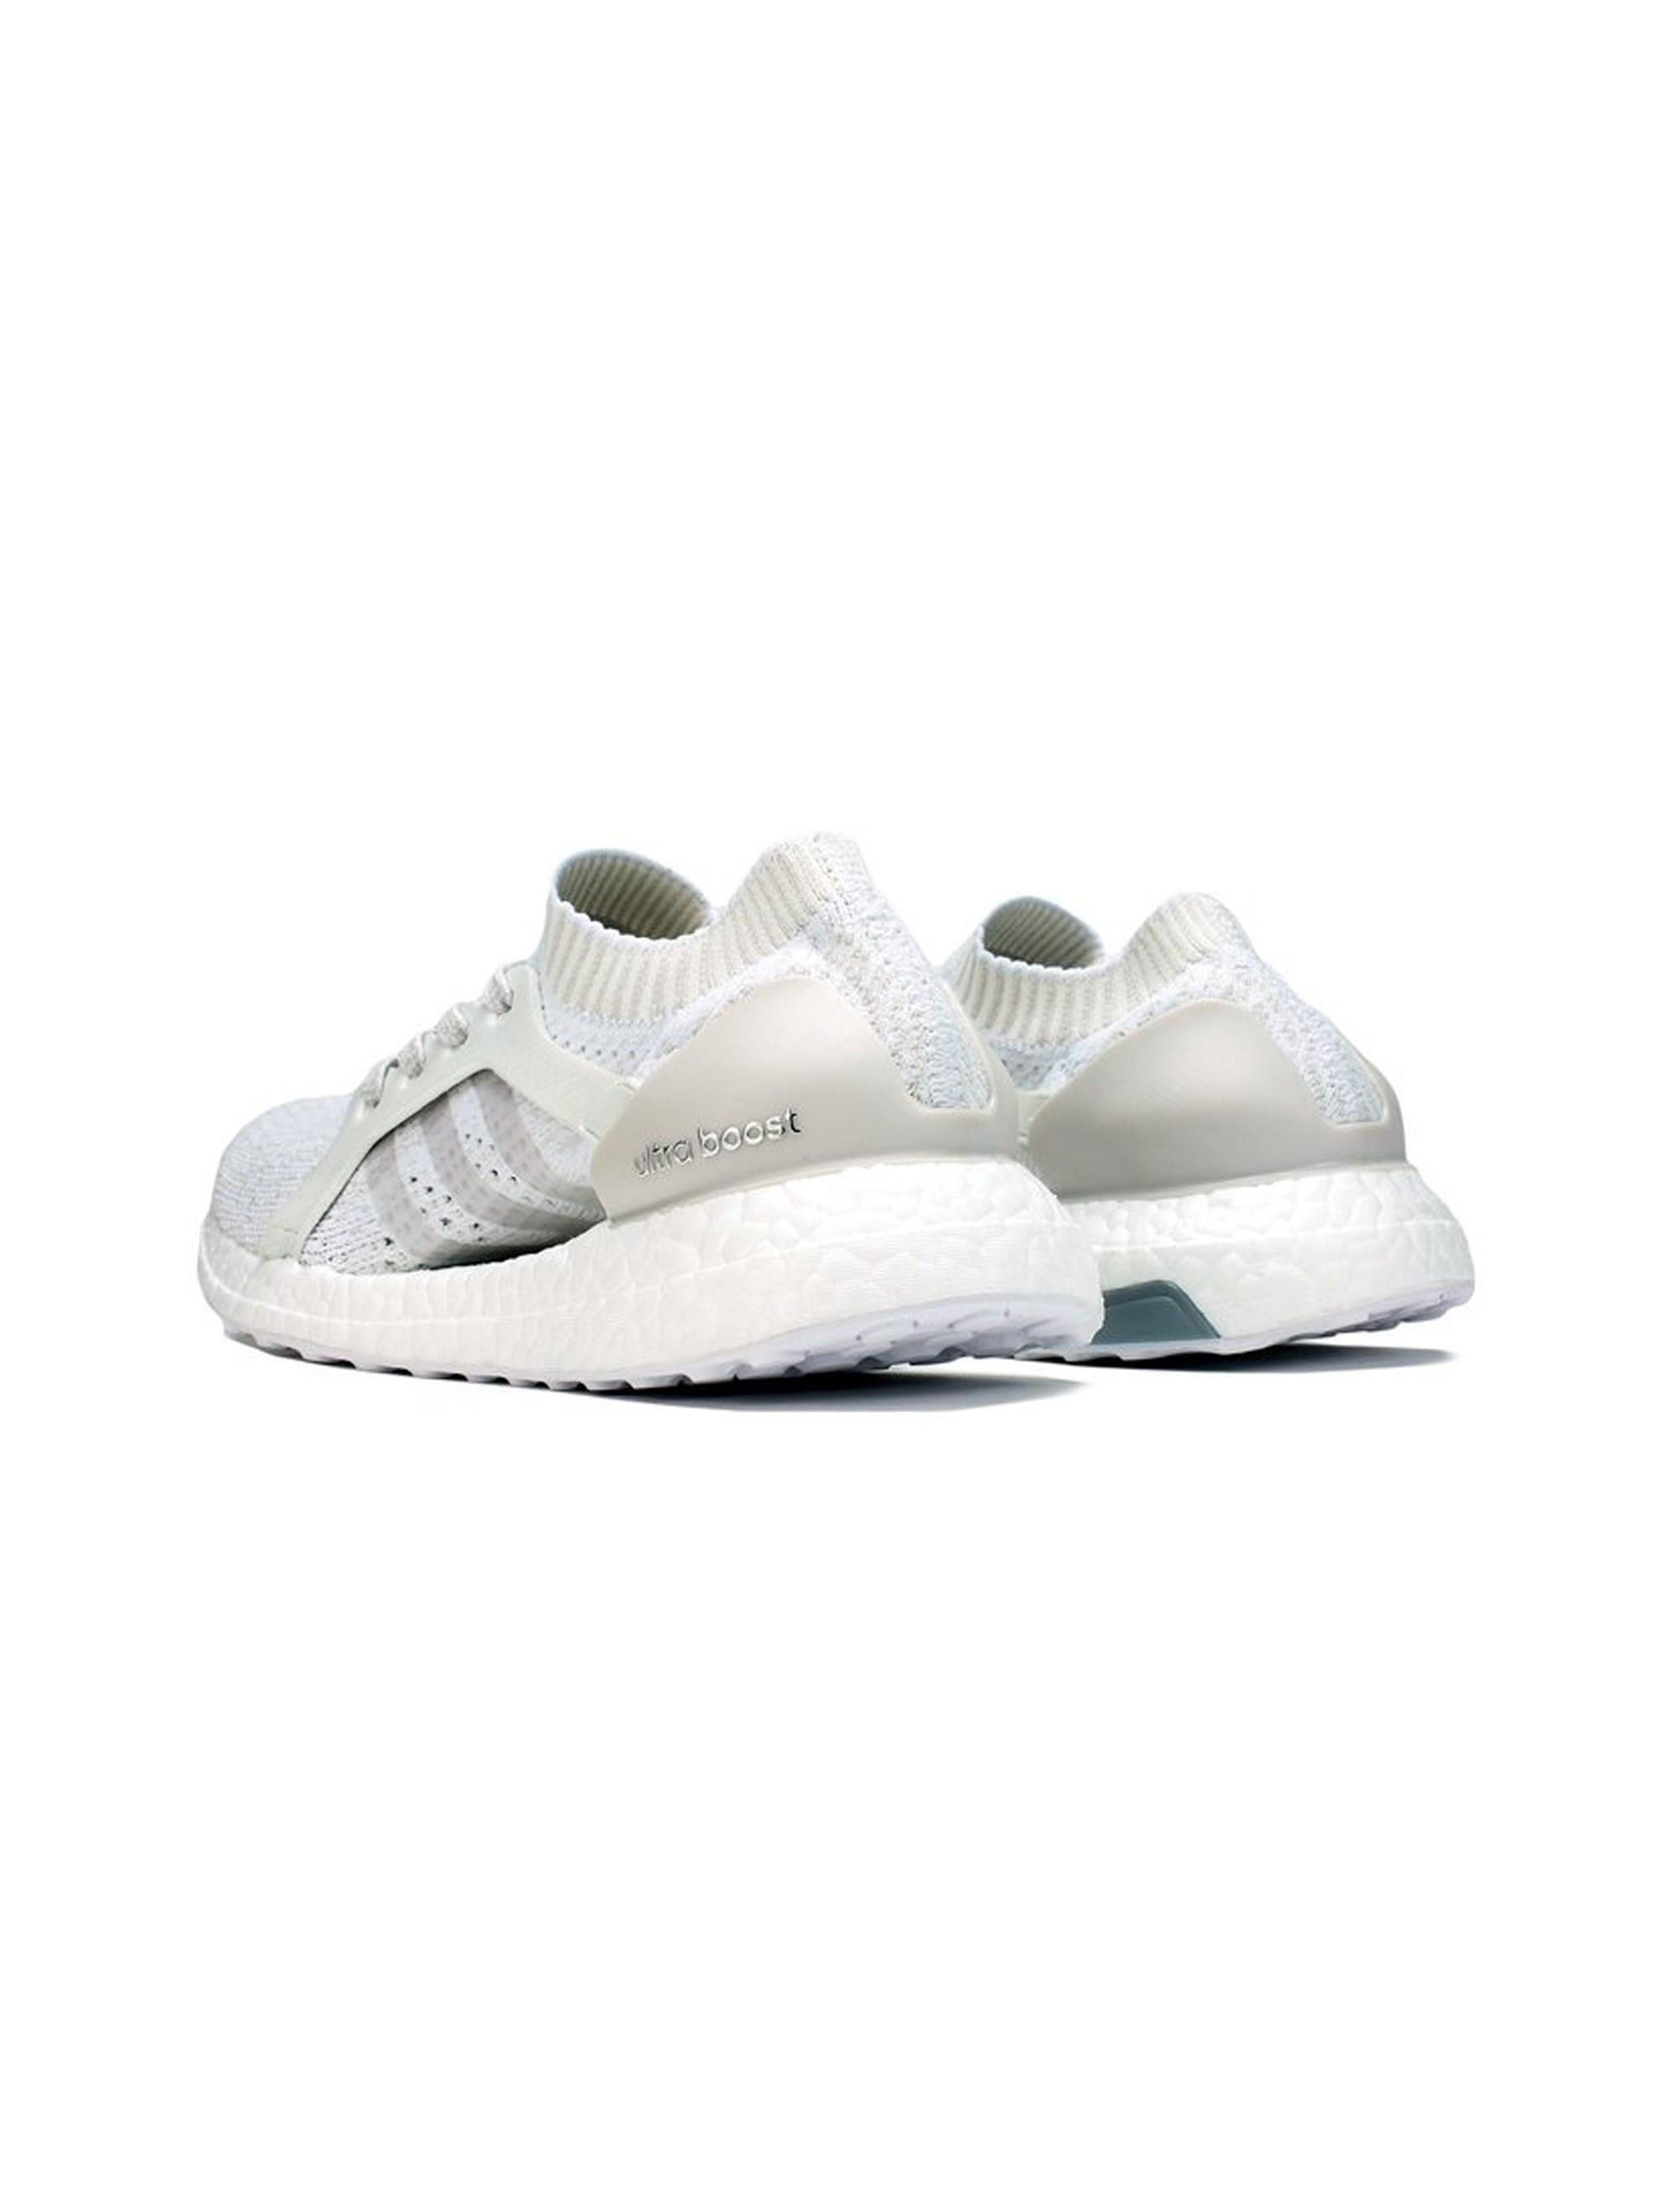 کفش مخصوص دویدن زنانه آدیداس مدل ULTRABOOST X - سفيد - 4